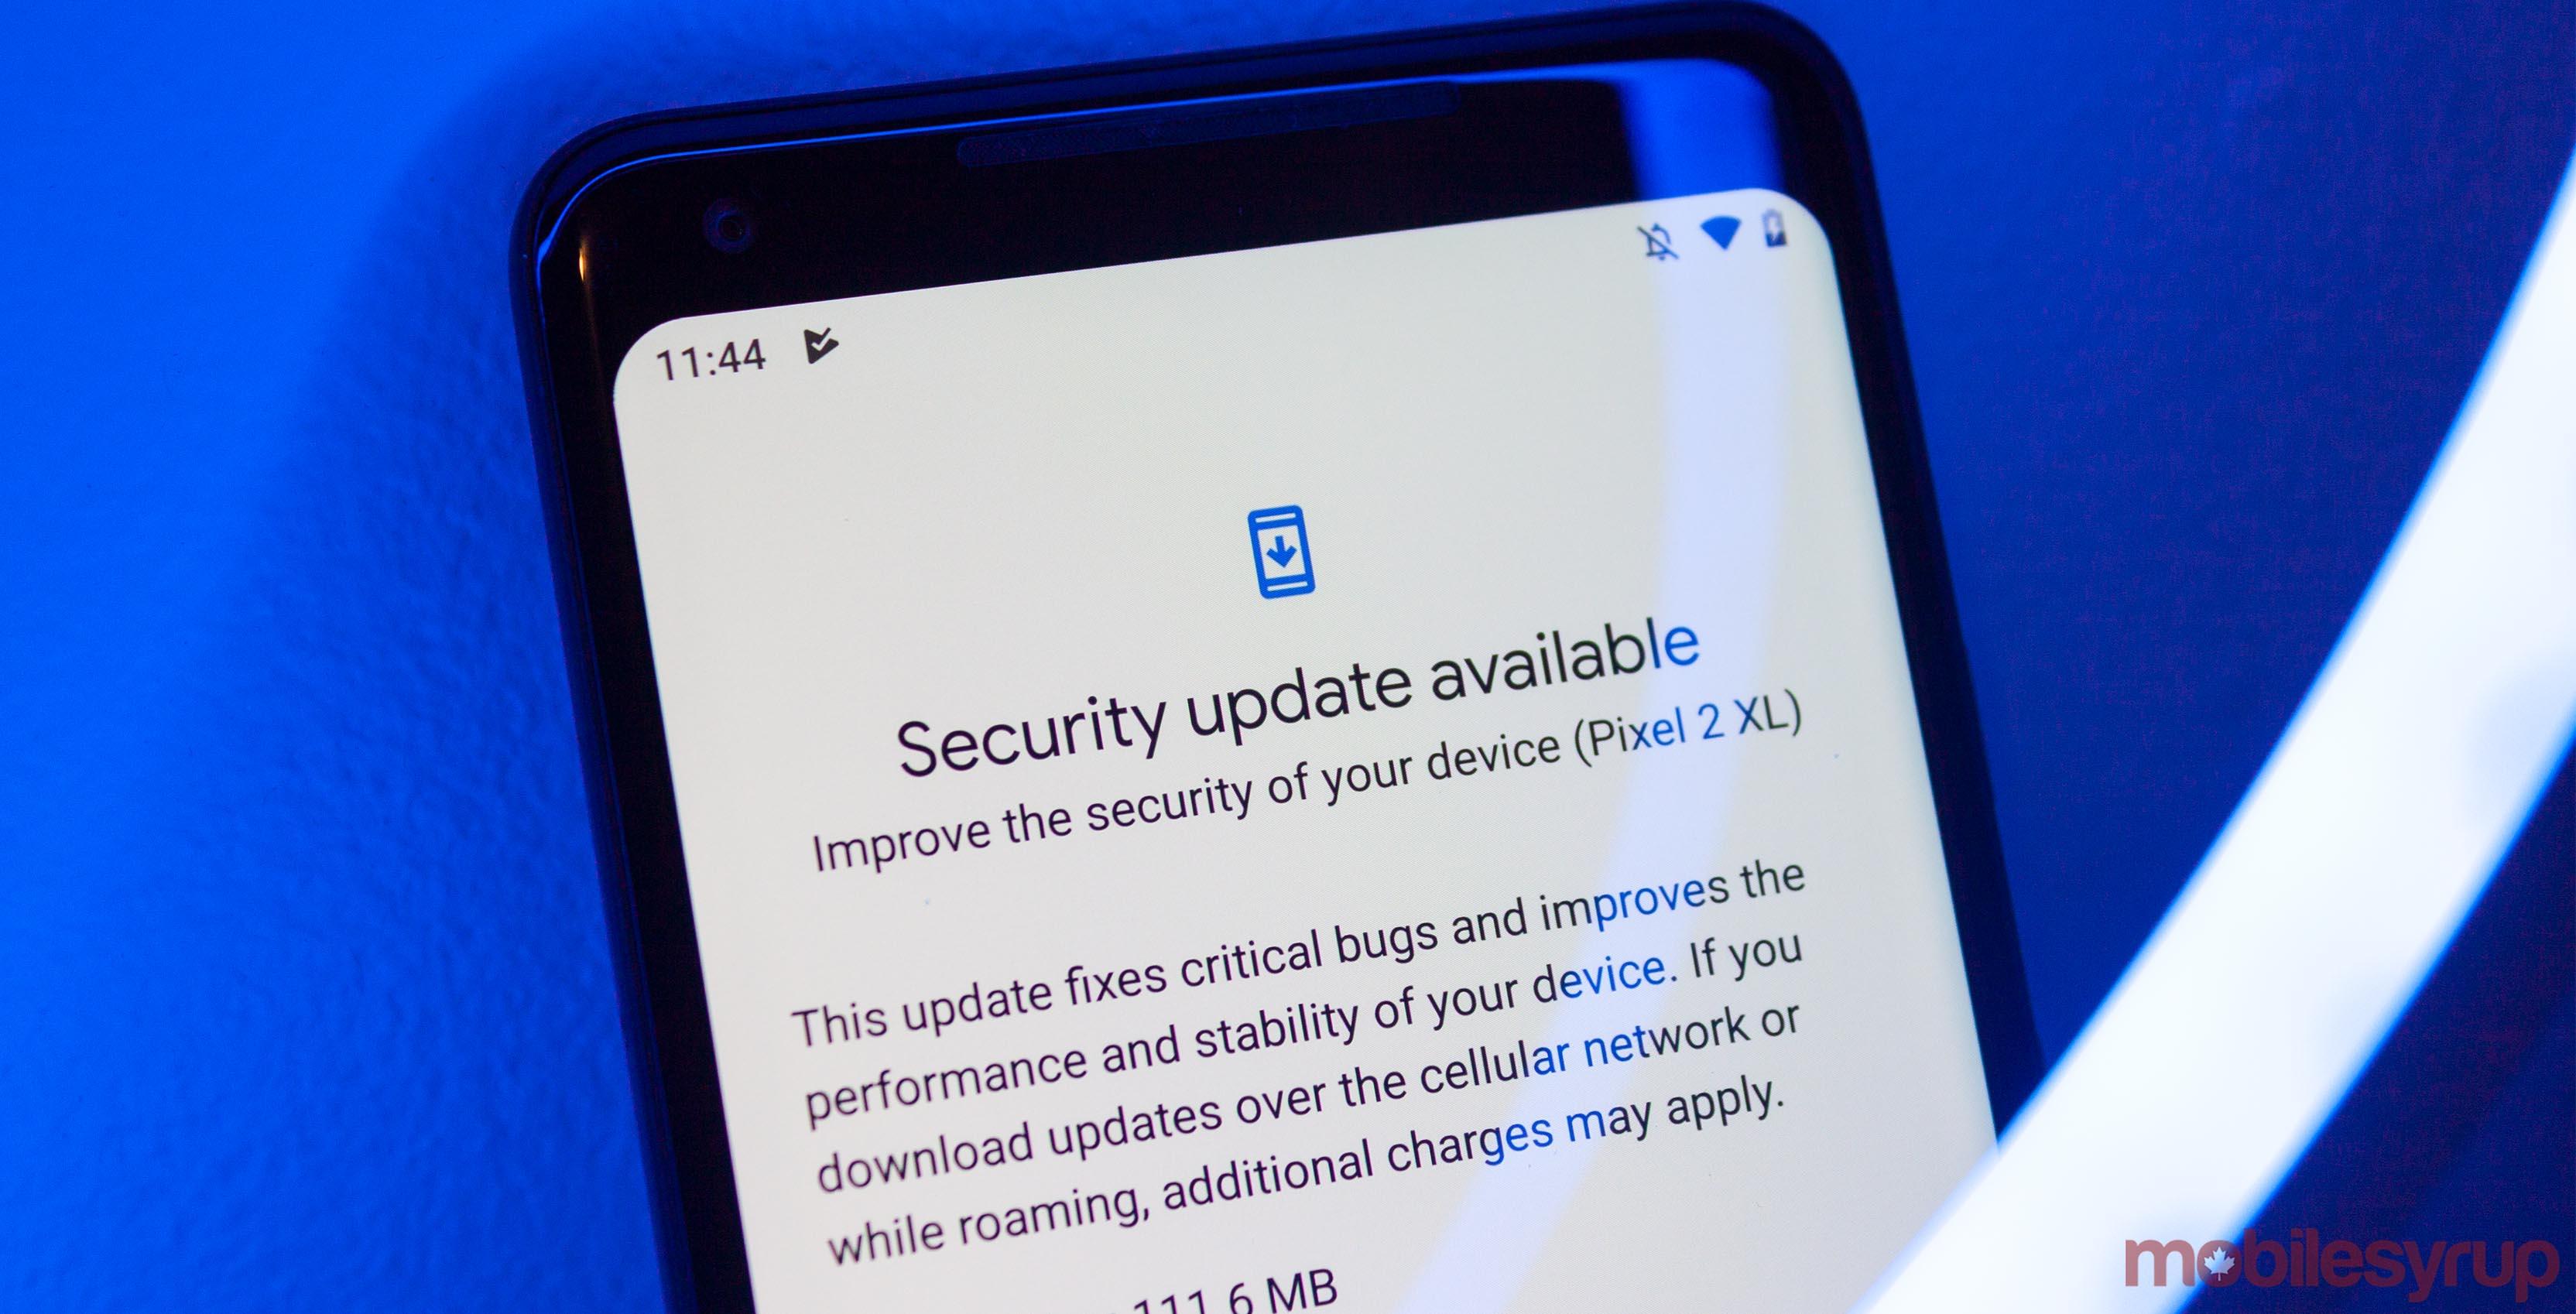 Security update header